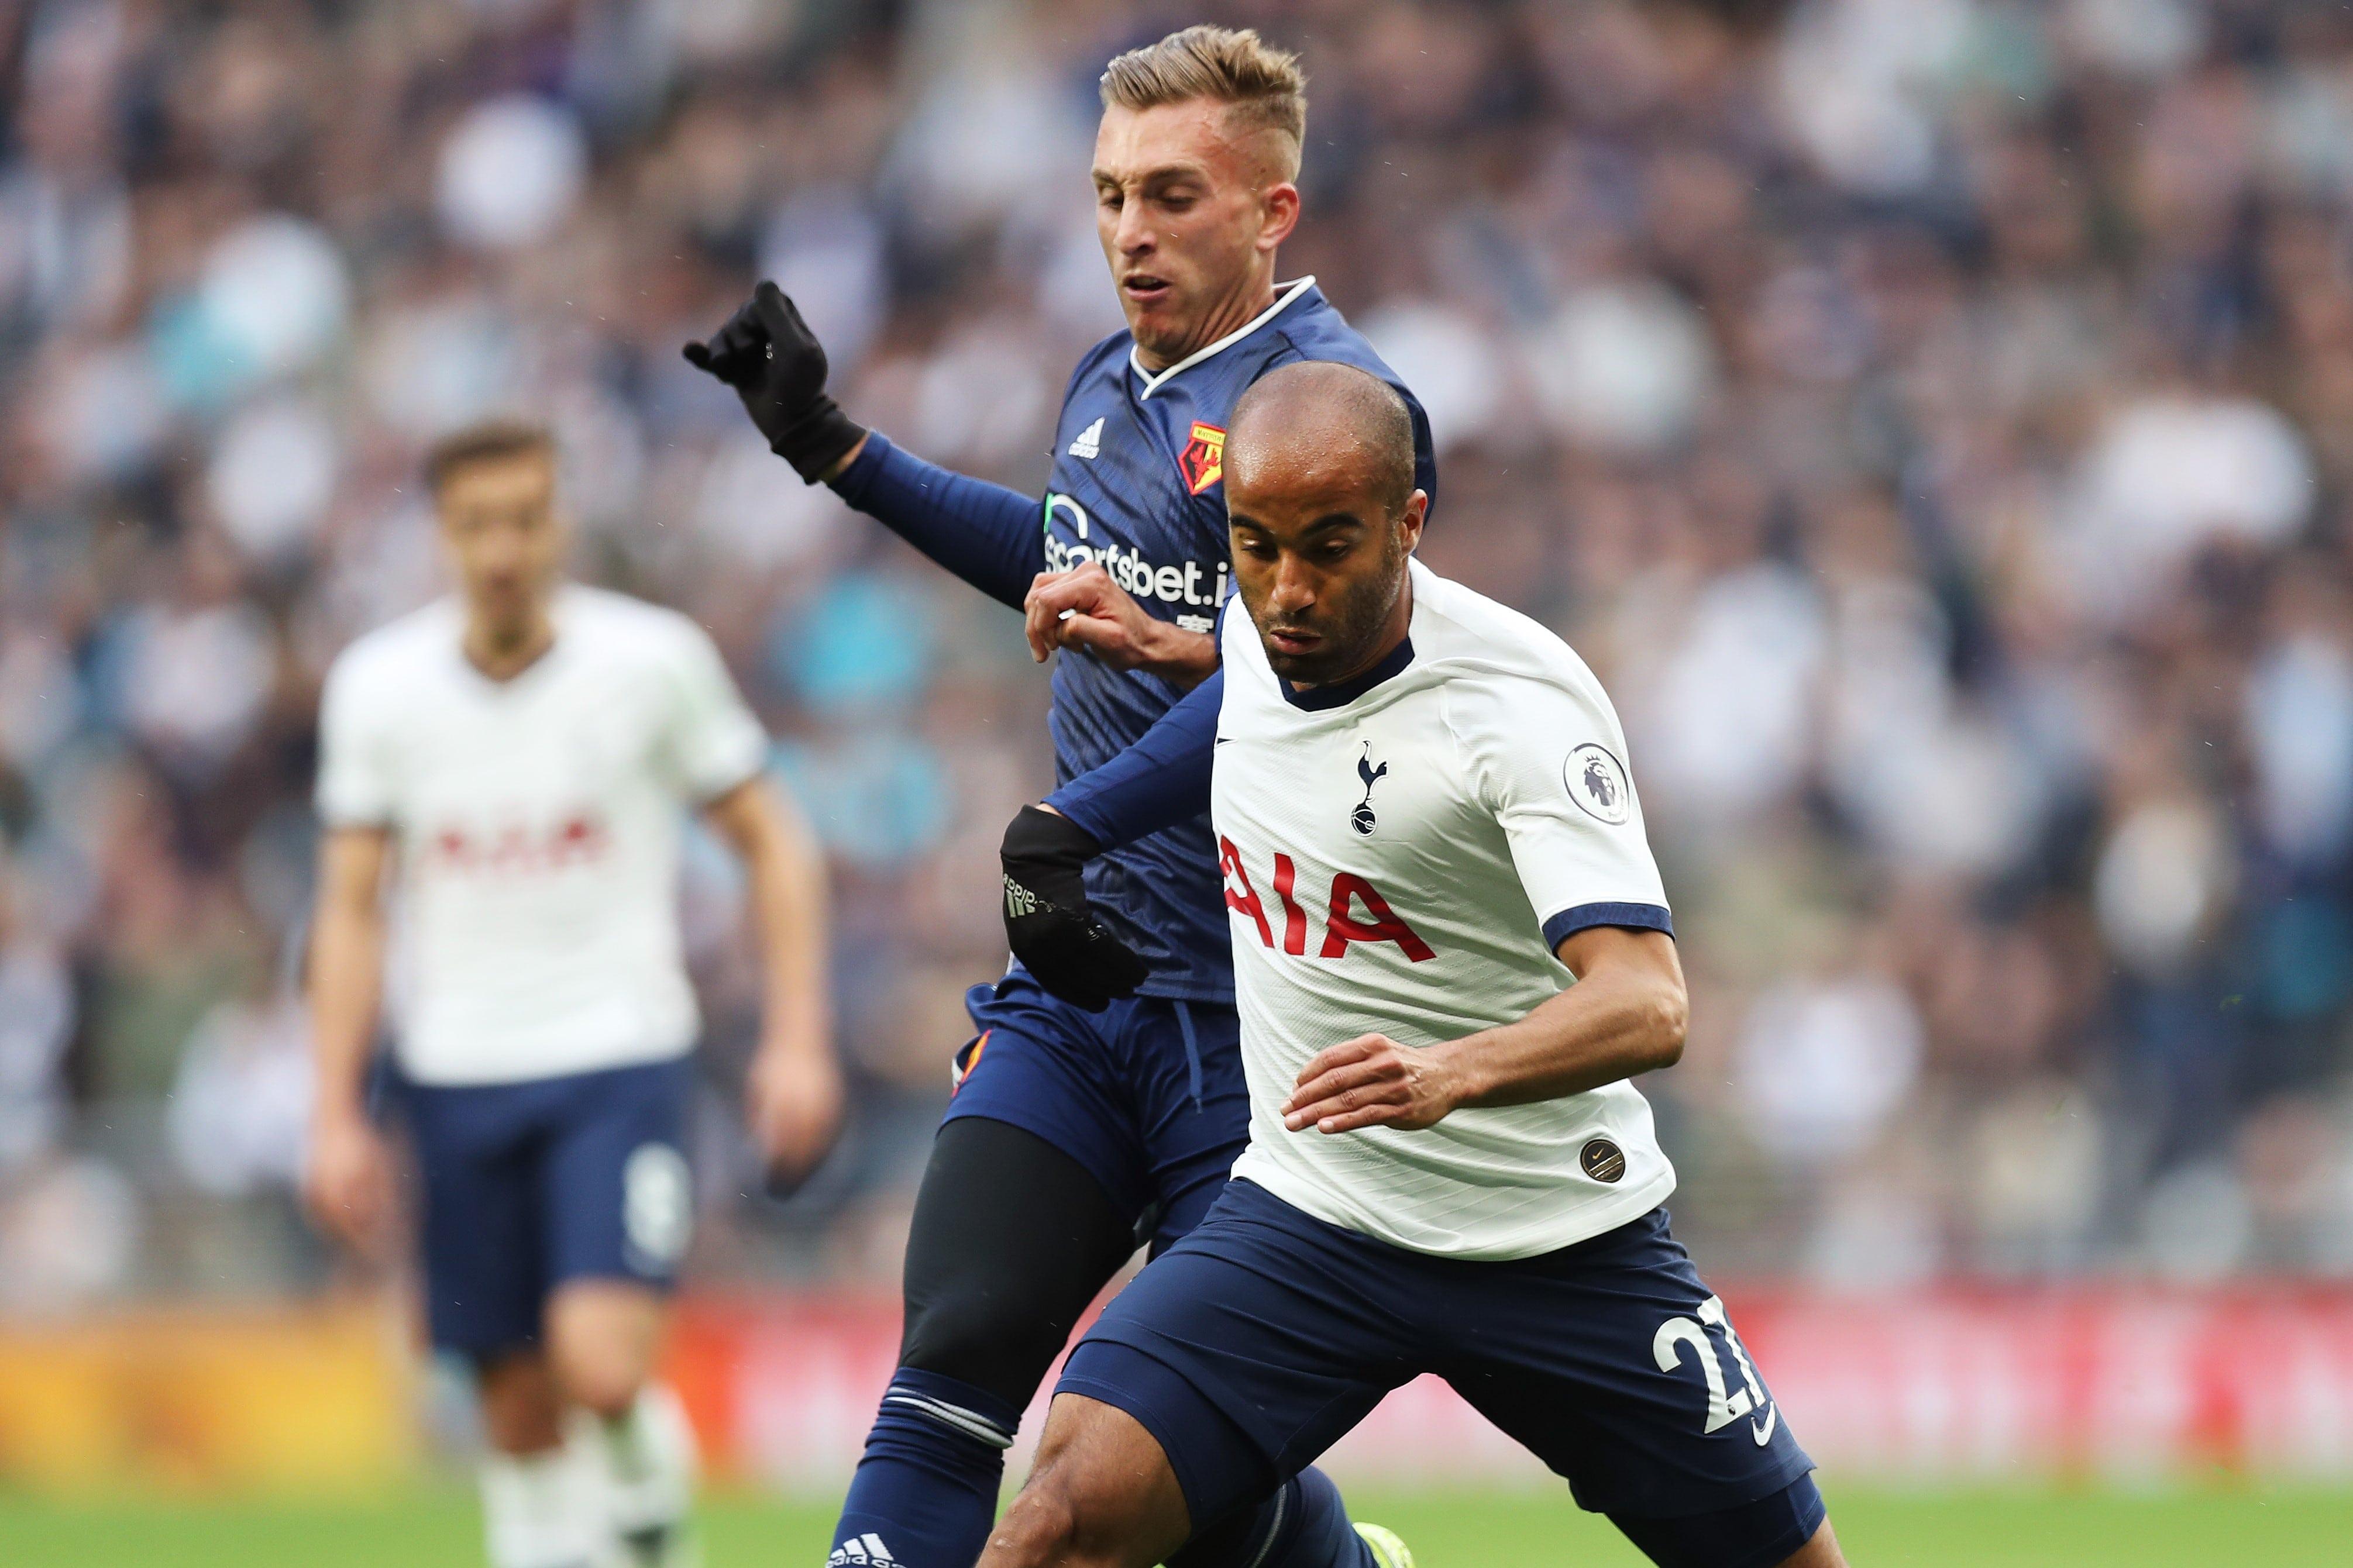 Watford vs Tottenham Free Betting Tips